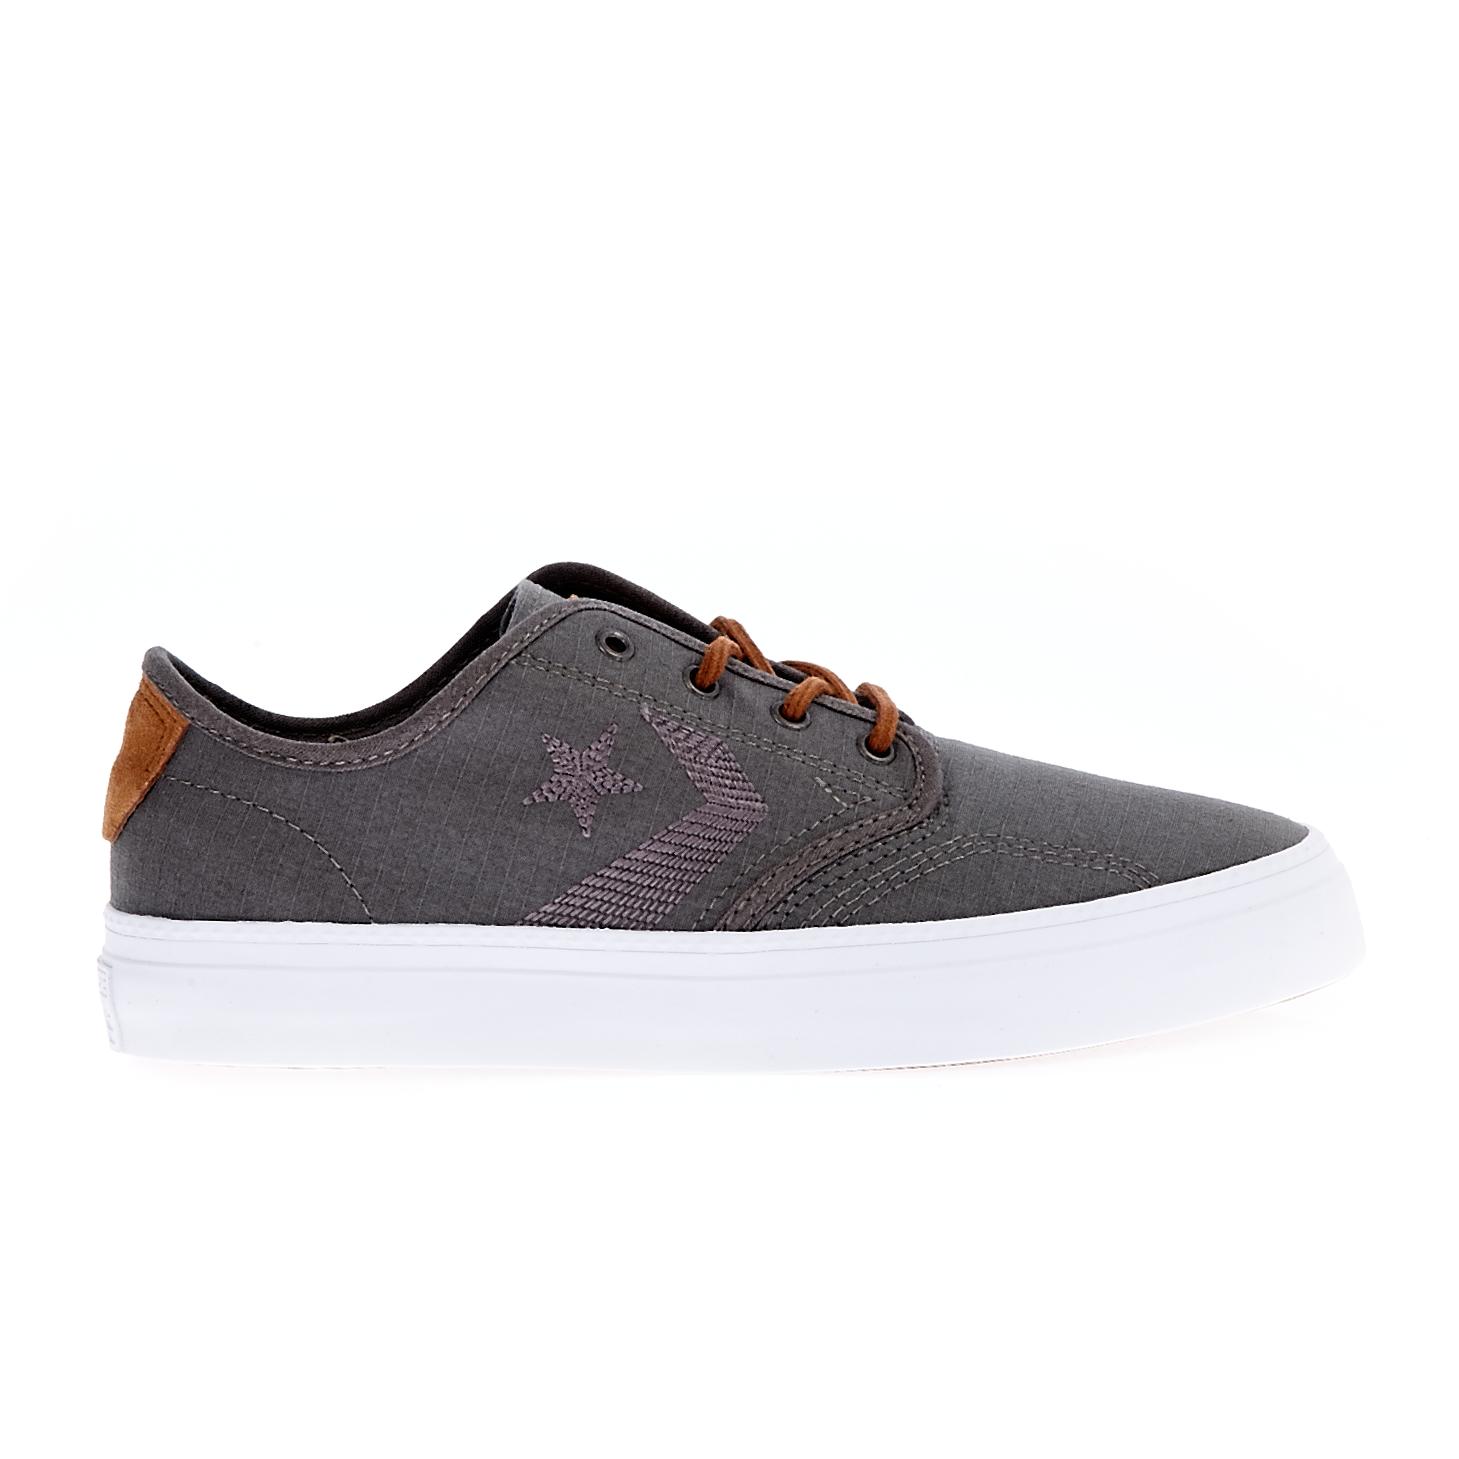 CONVERSE - Unisex παπούτσια Cons Zakim Ox γκρι ανδρικά παπούτσια sneakers